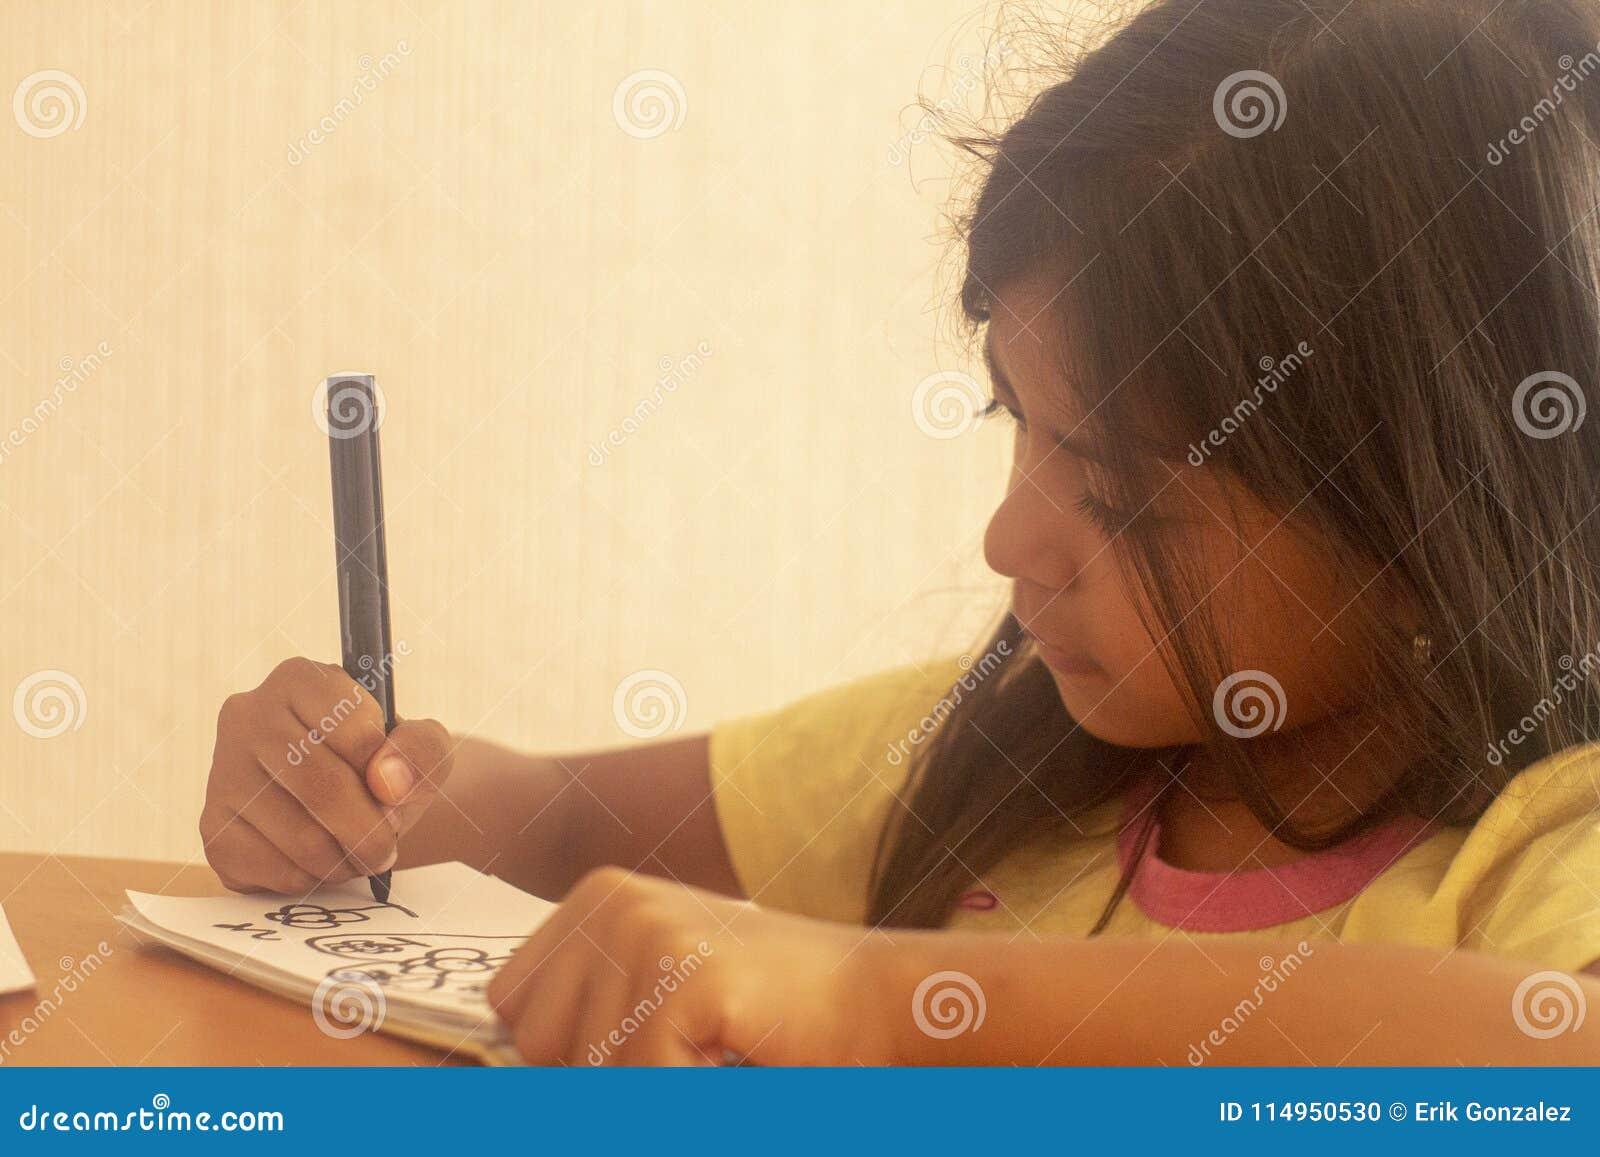 Cute brunette girl doing dubujos on a table